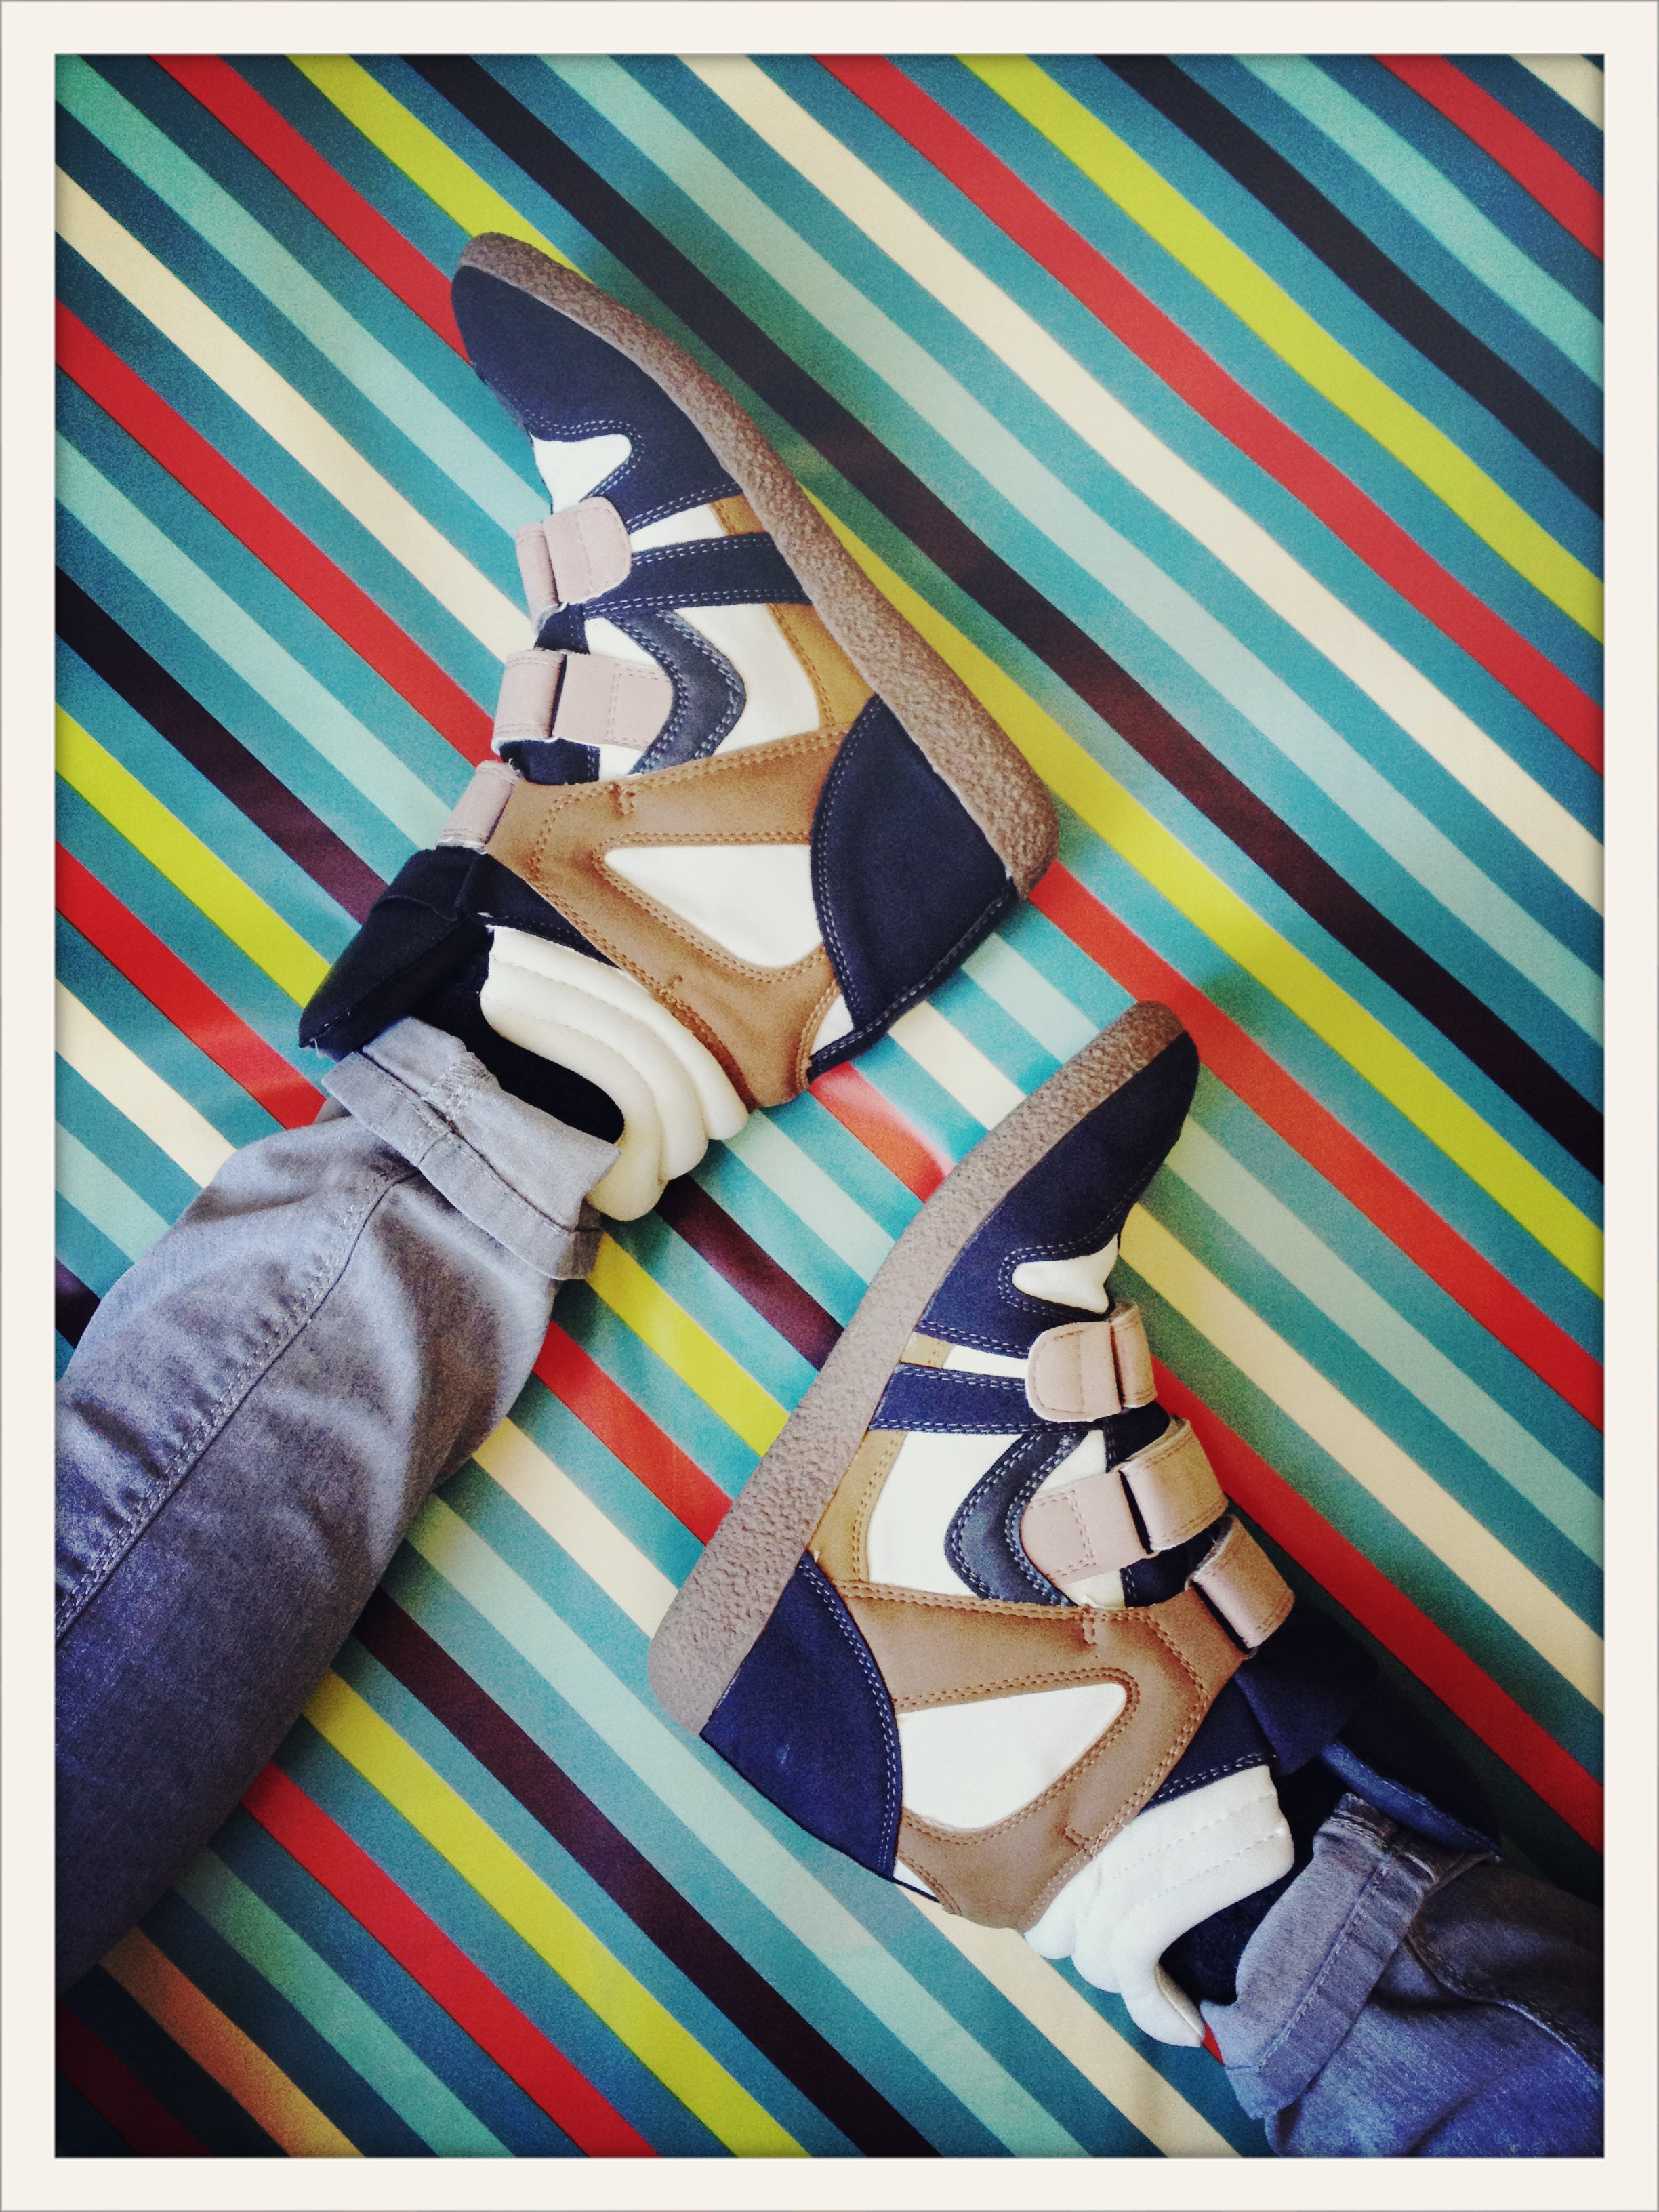 wedge sneakers on stripes